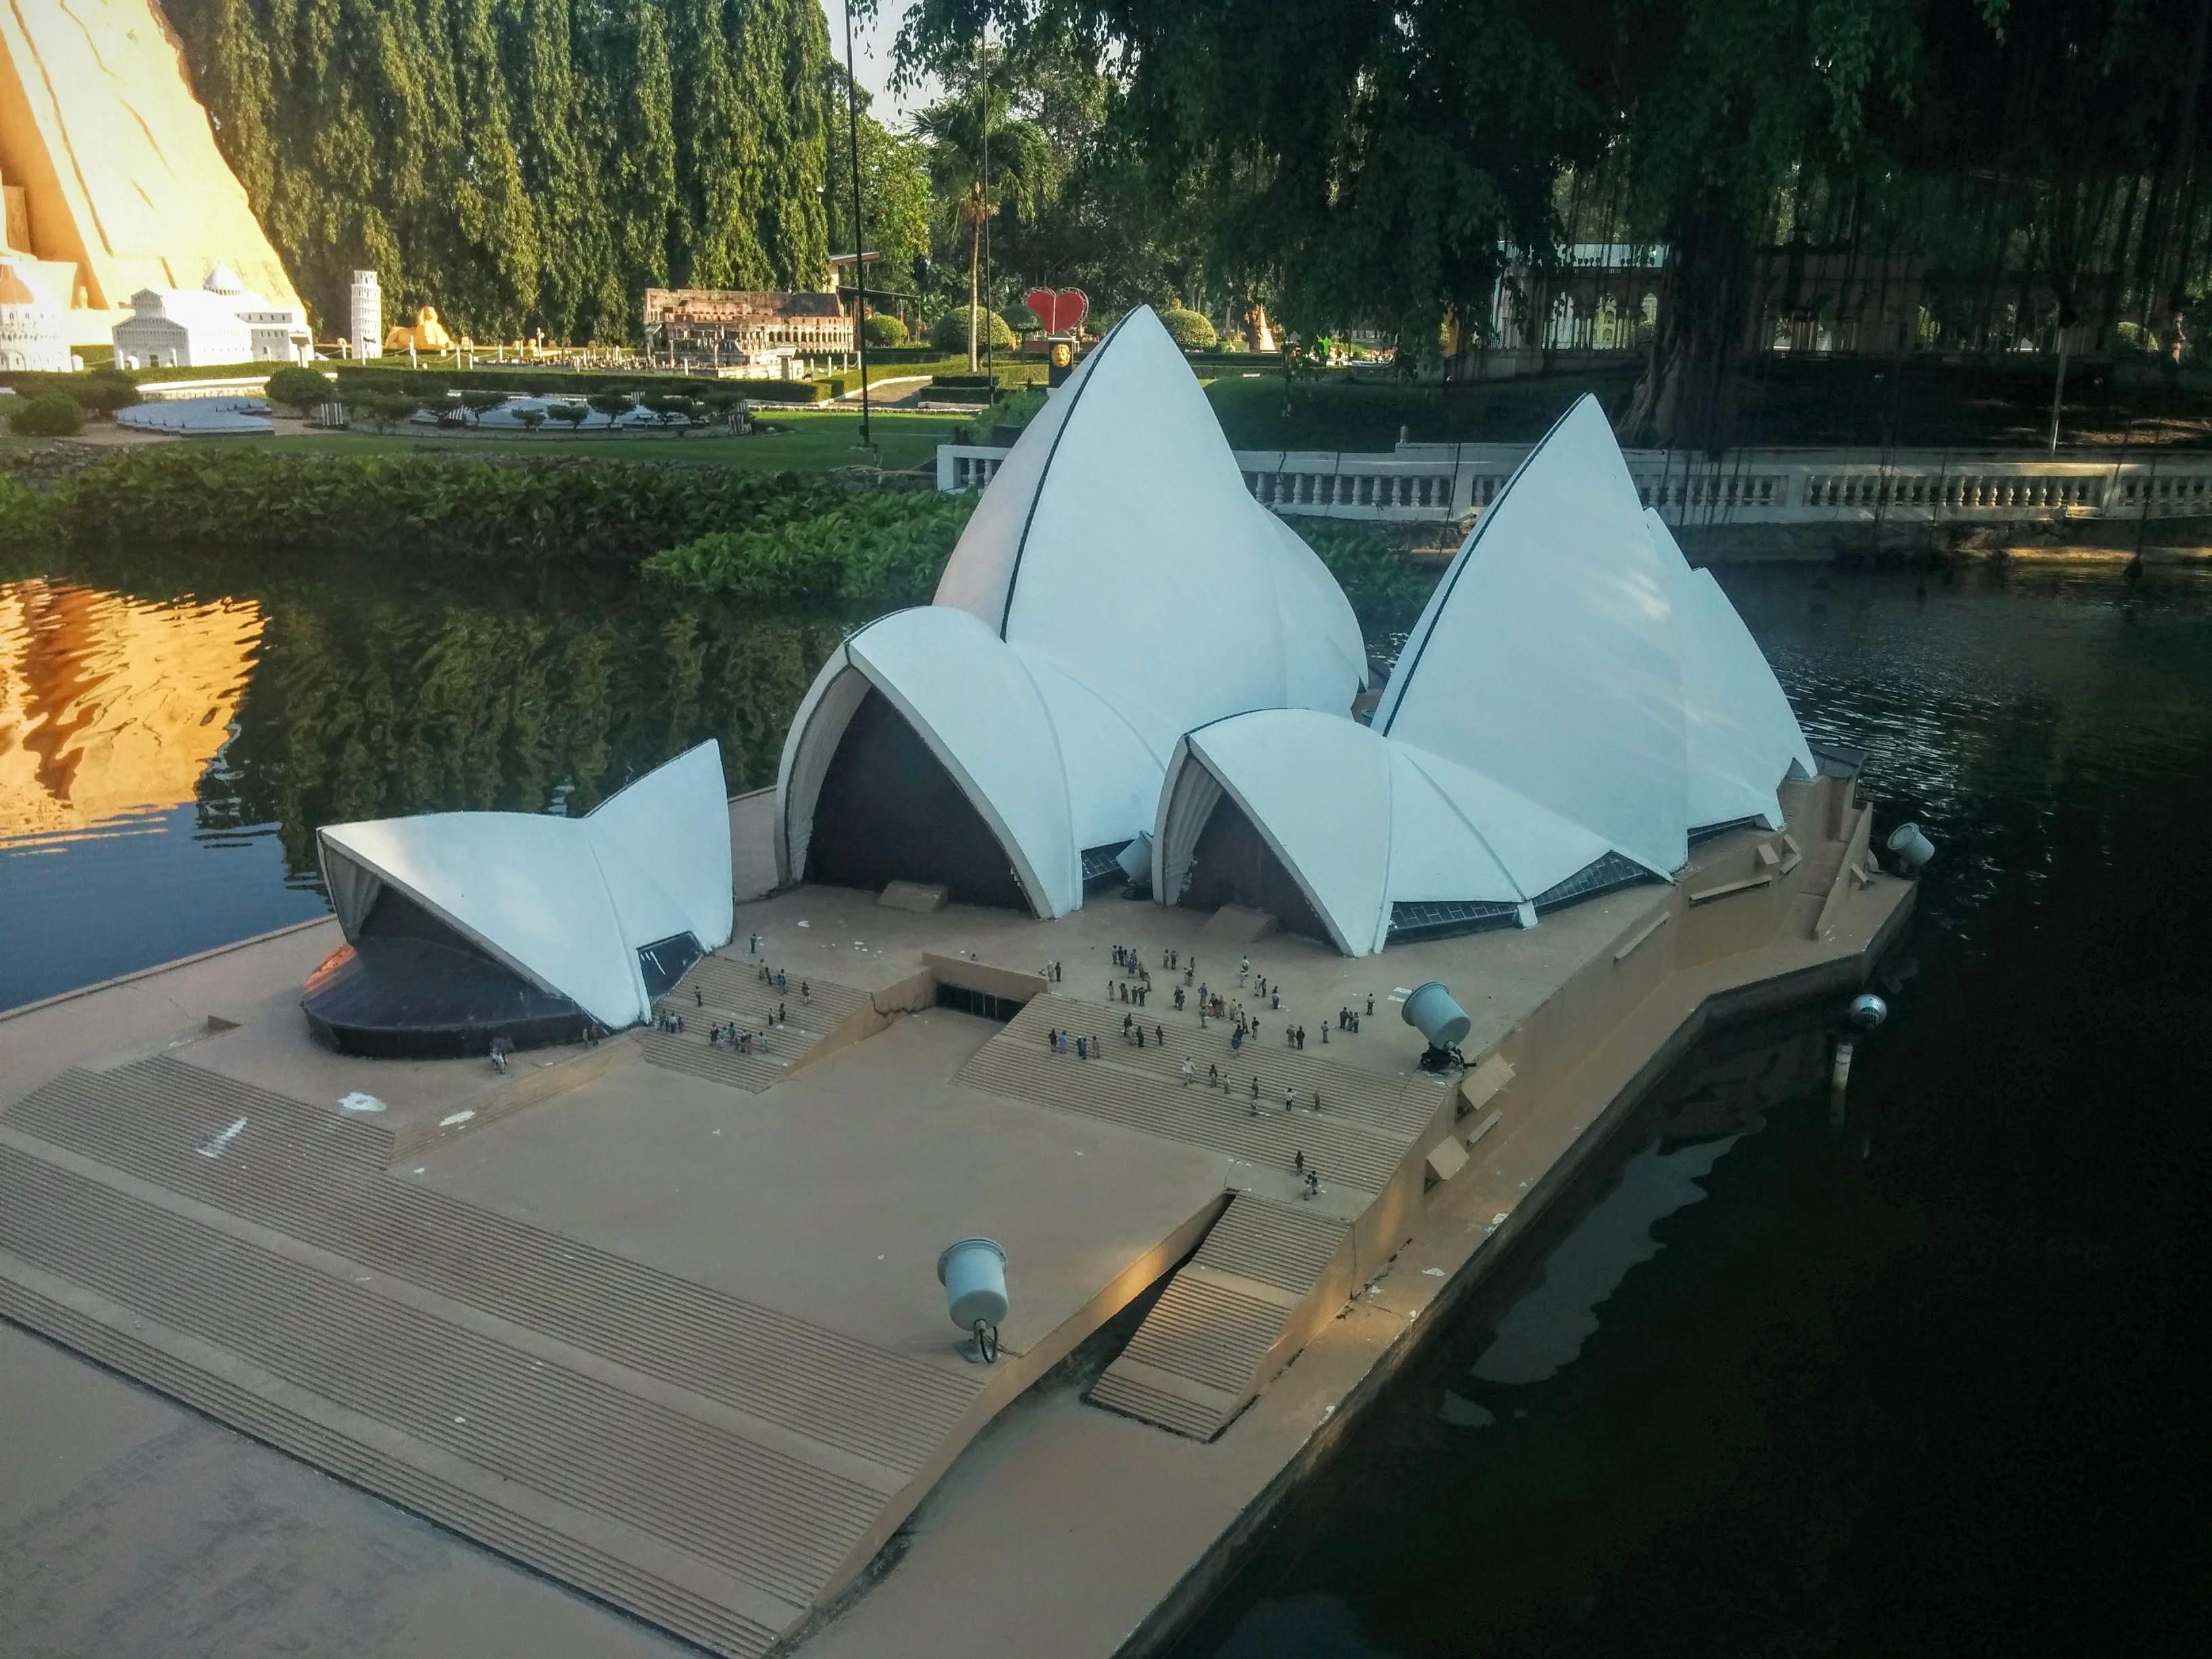 Сиднейская опера в миниатюре: в парке мини Сиам в Паттайе